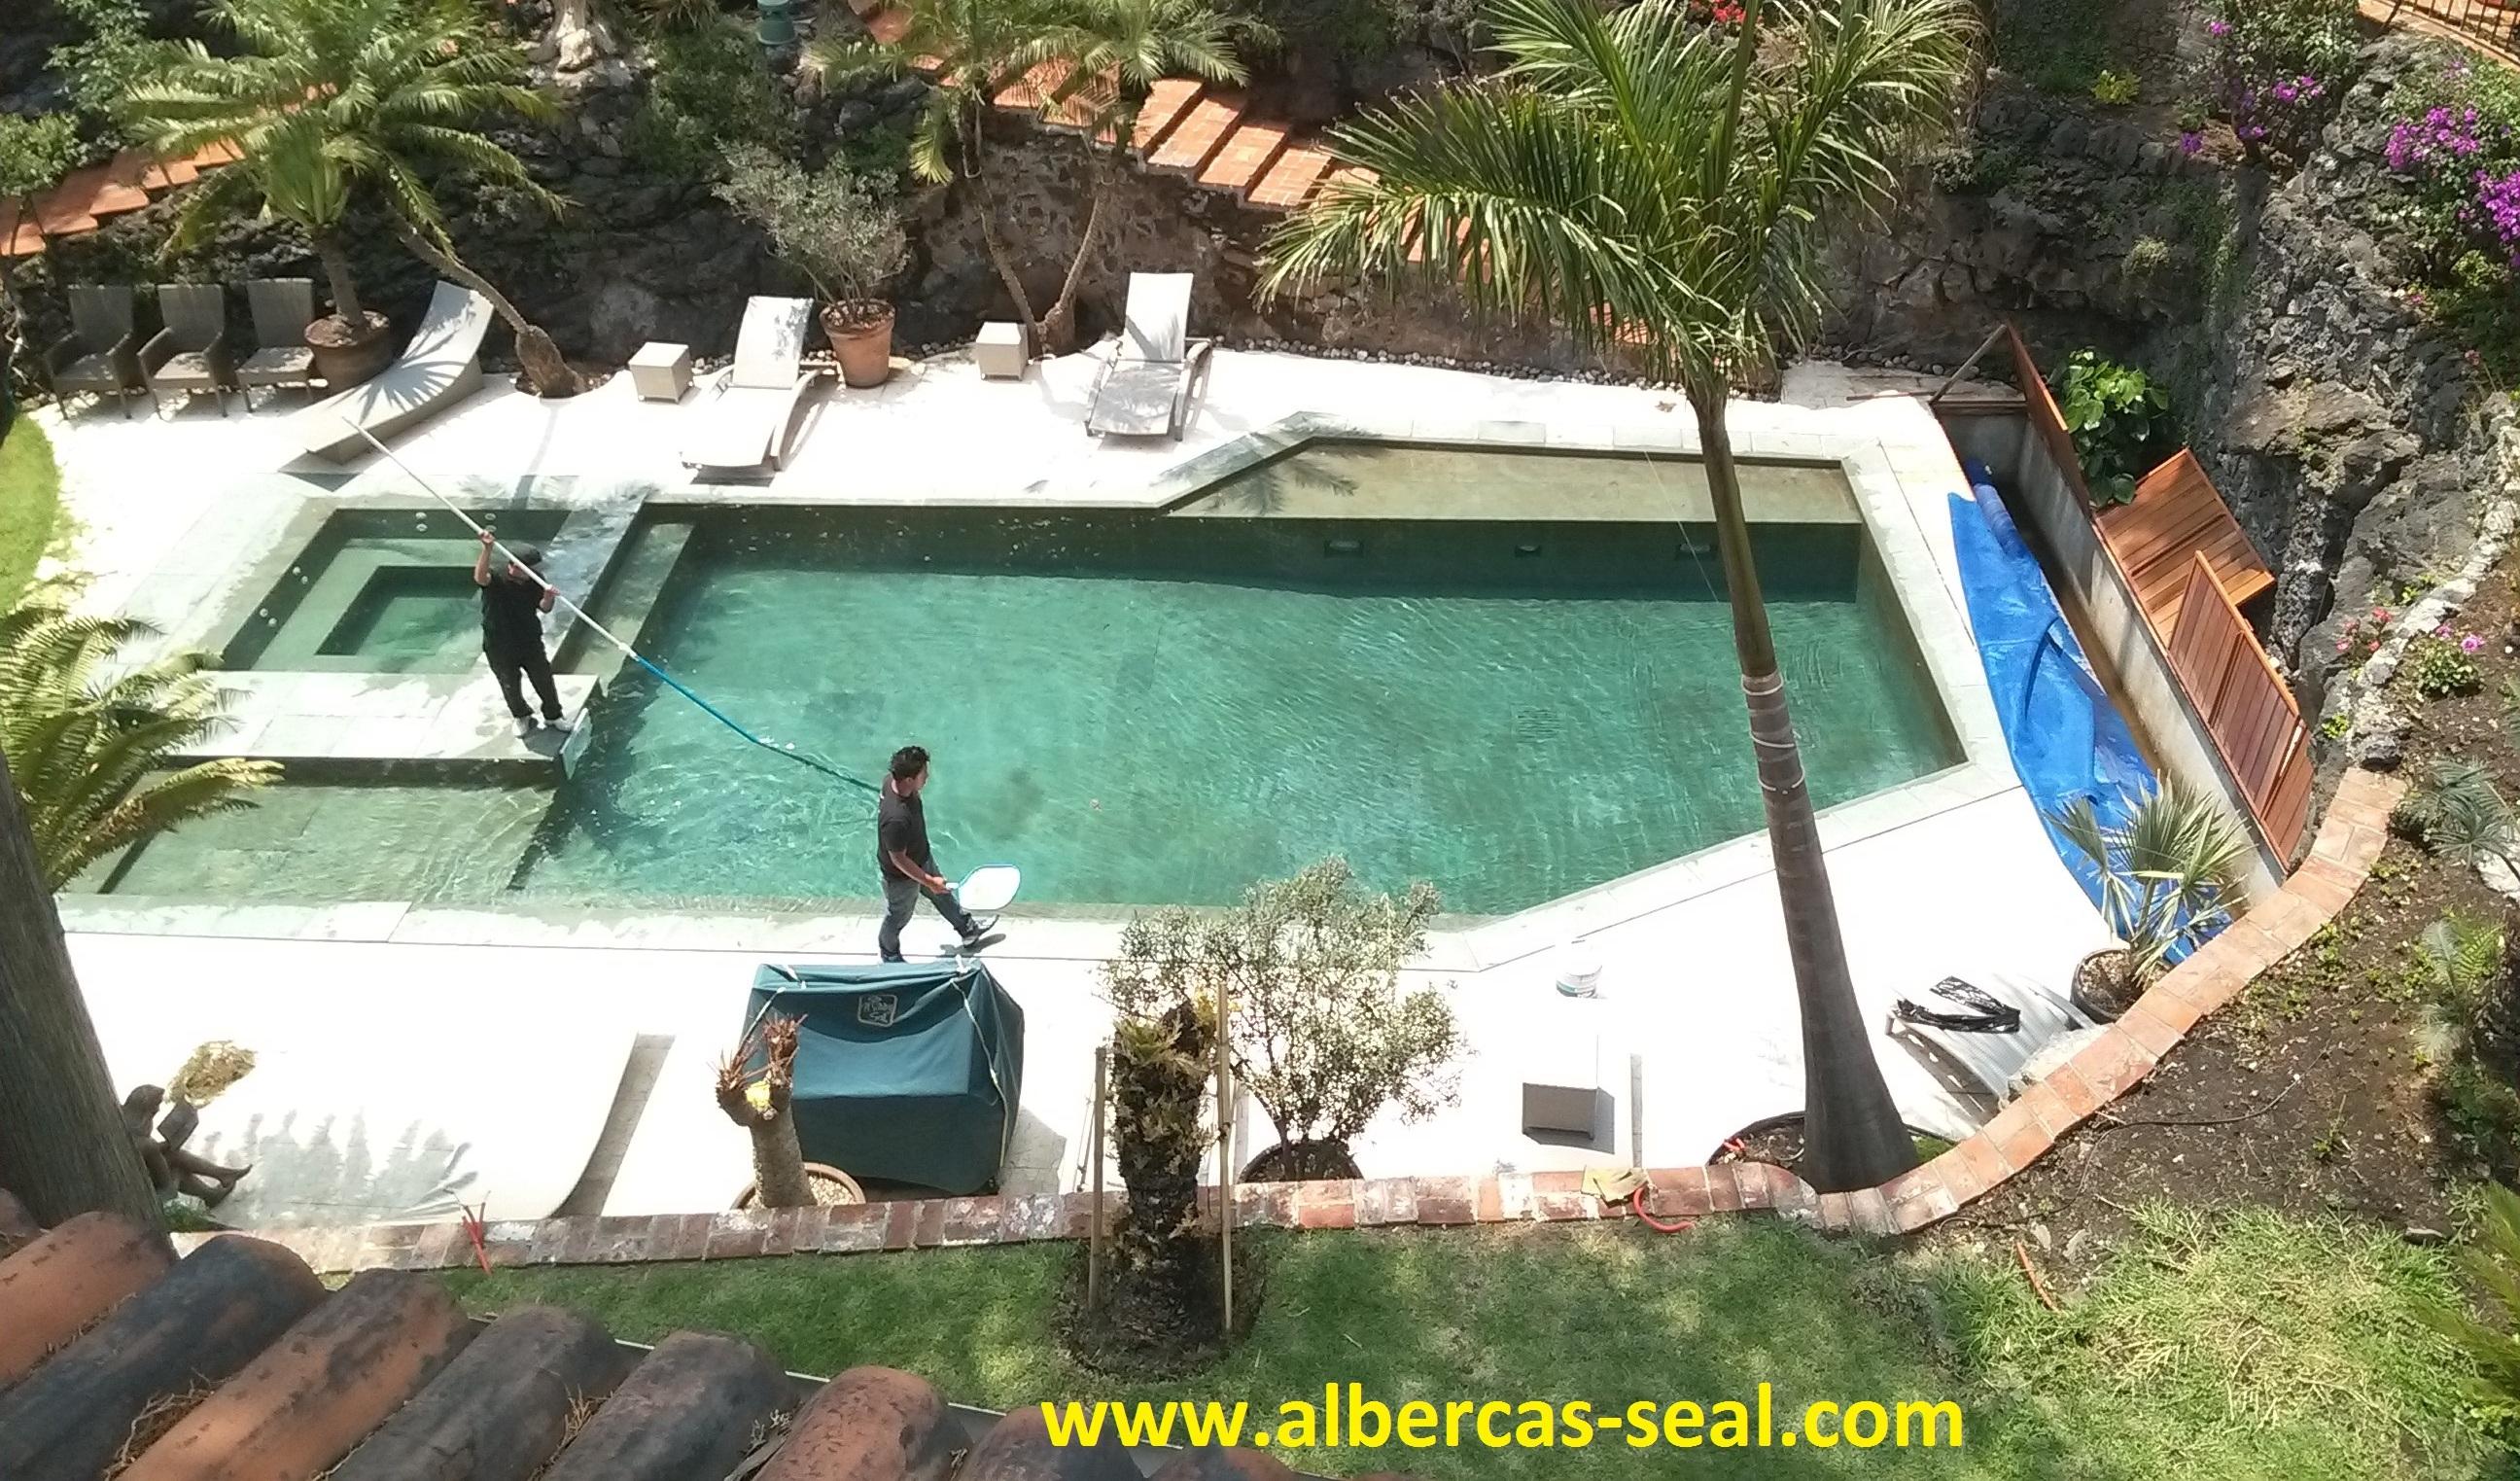 Construccion de albercas ecologicas en mexico for Construccion de piscinas en mexico